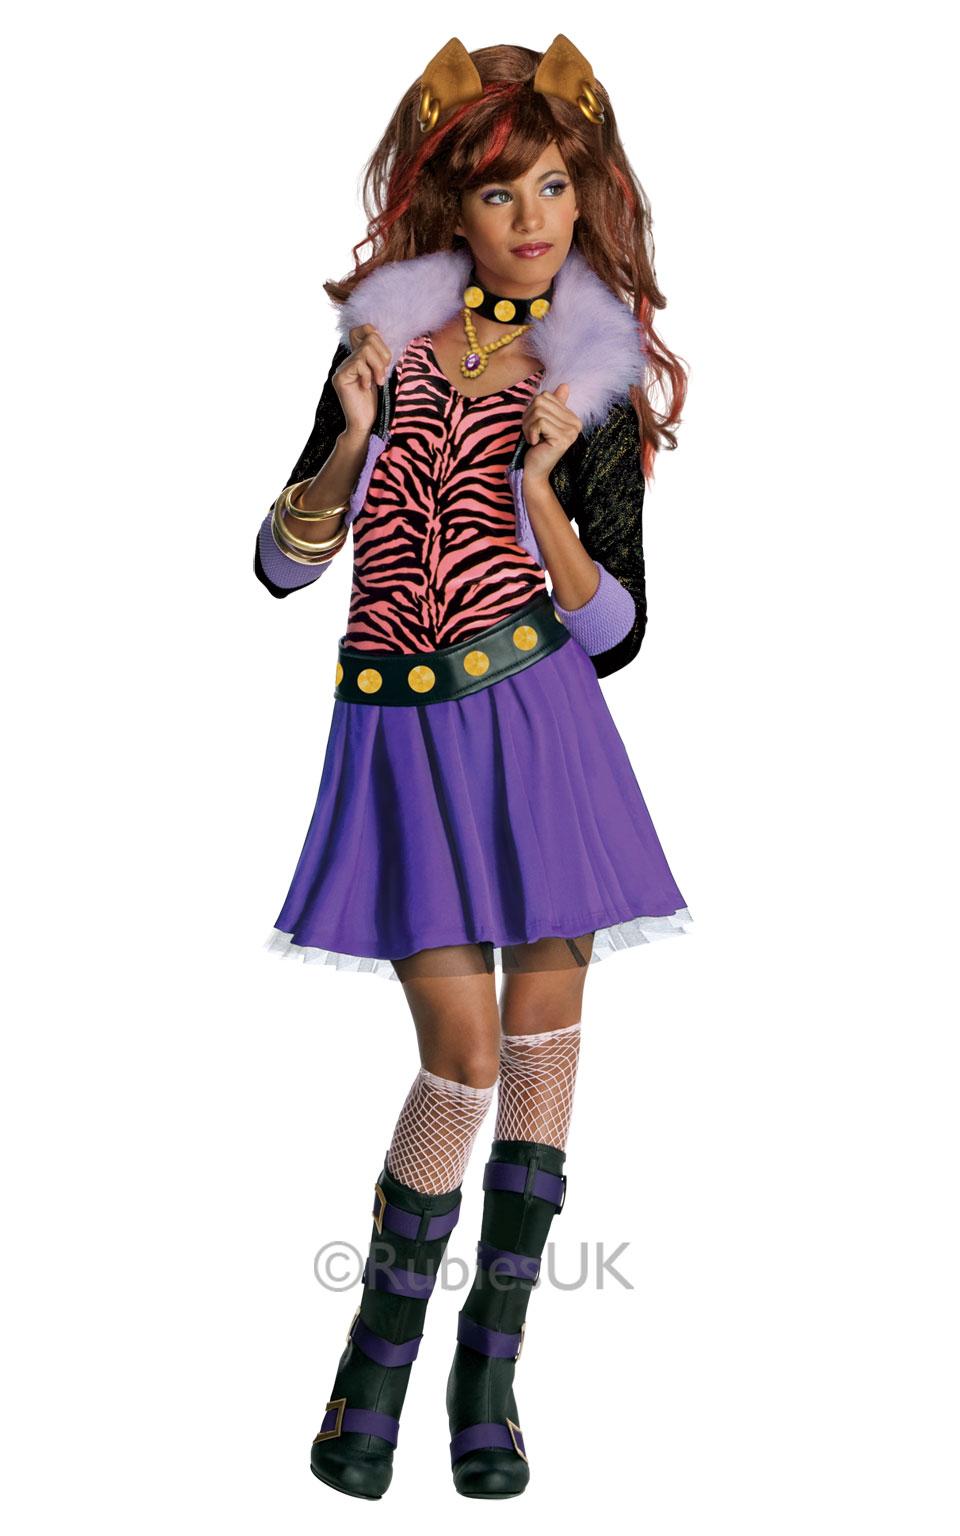 Childrens girls monster high fancy dress costume outfit halloween book week ebay - Tenue monster high ...